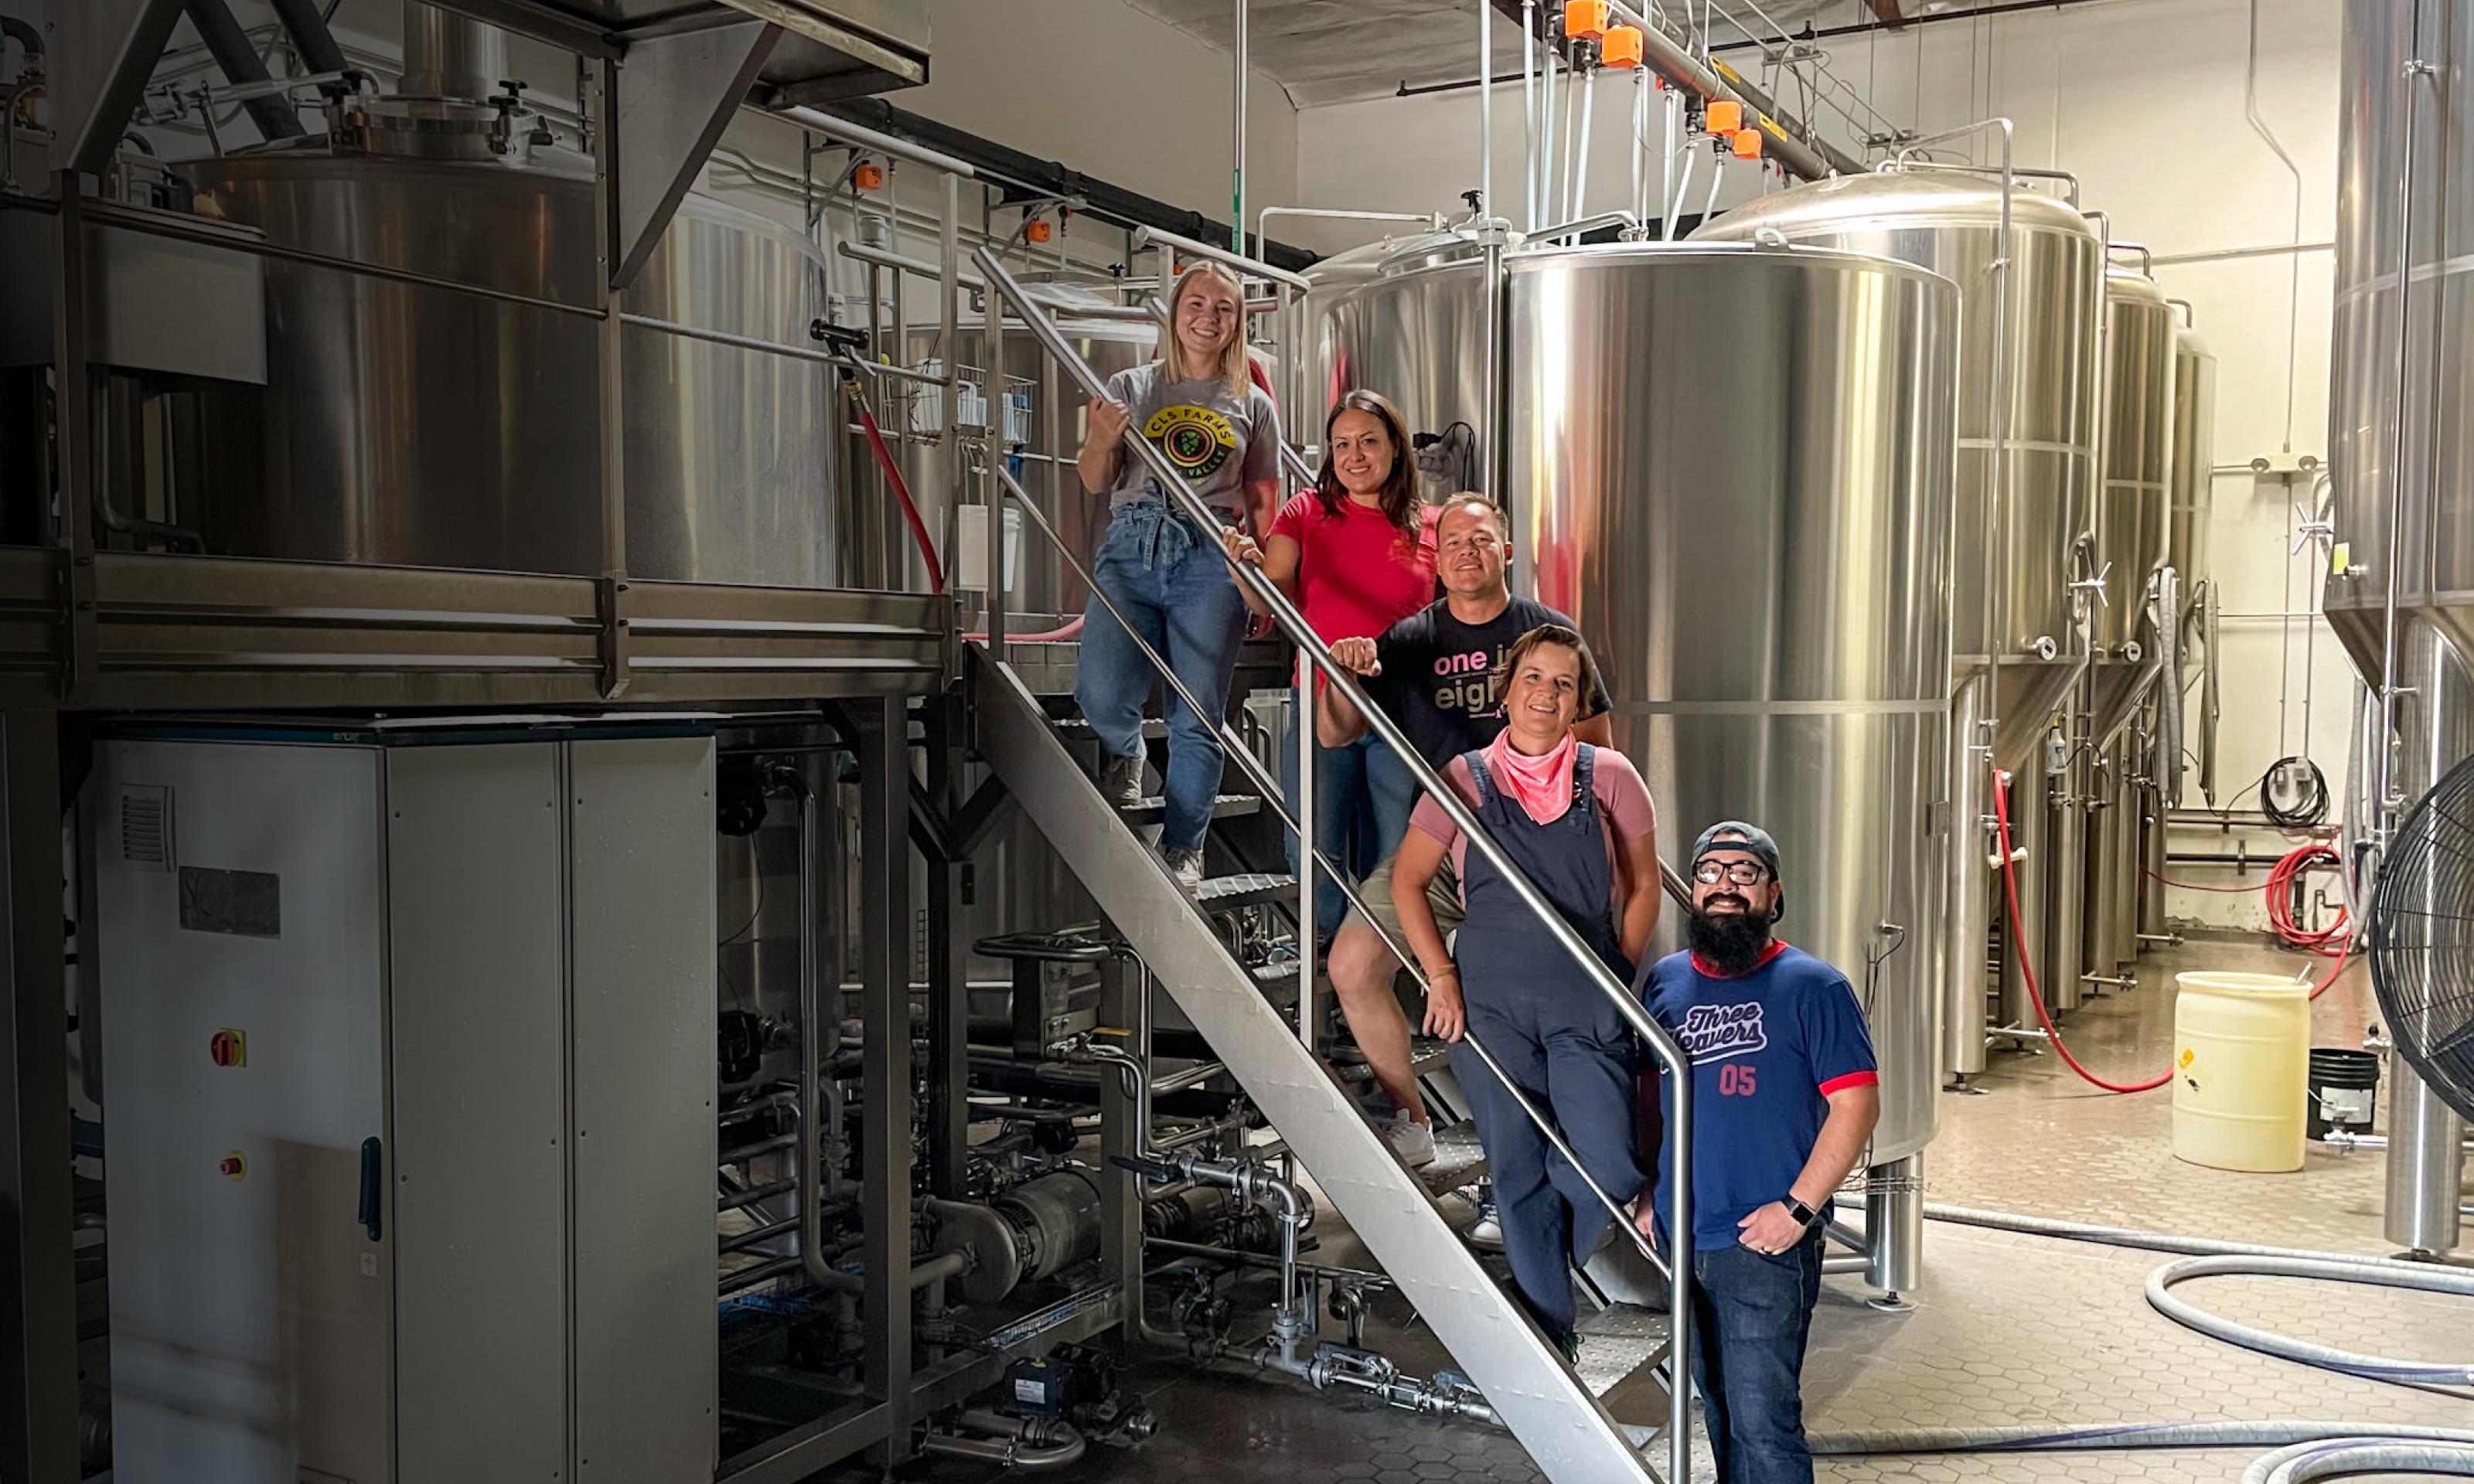 Three Weavers brewers and CLS Farms brewing an el dorado beer